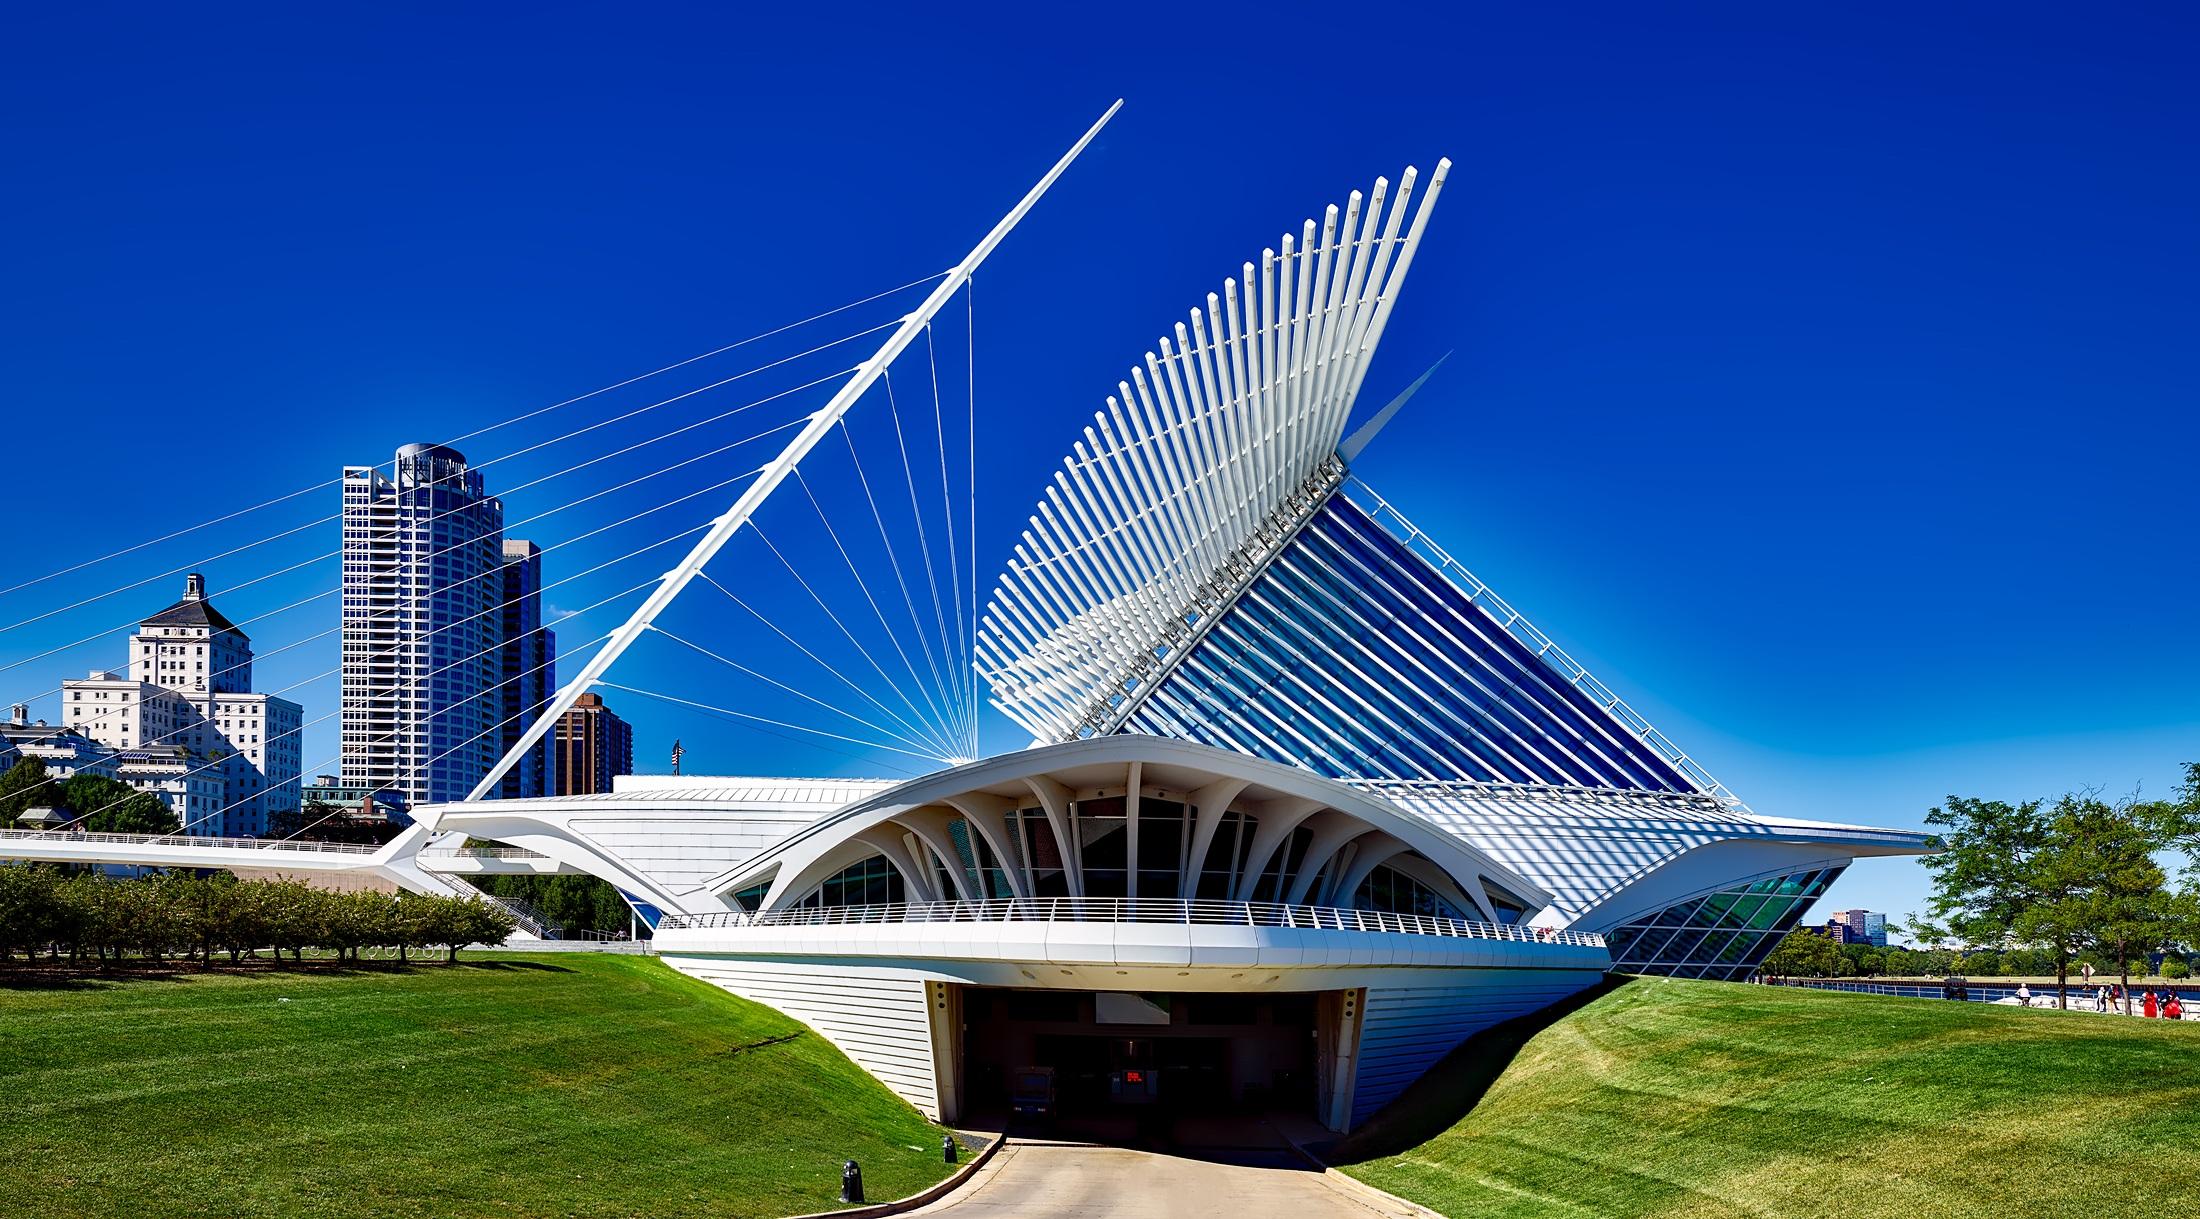 Who Designed The Milwaukee Art Museum